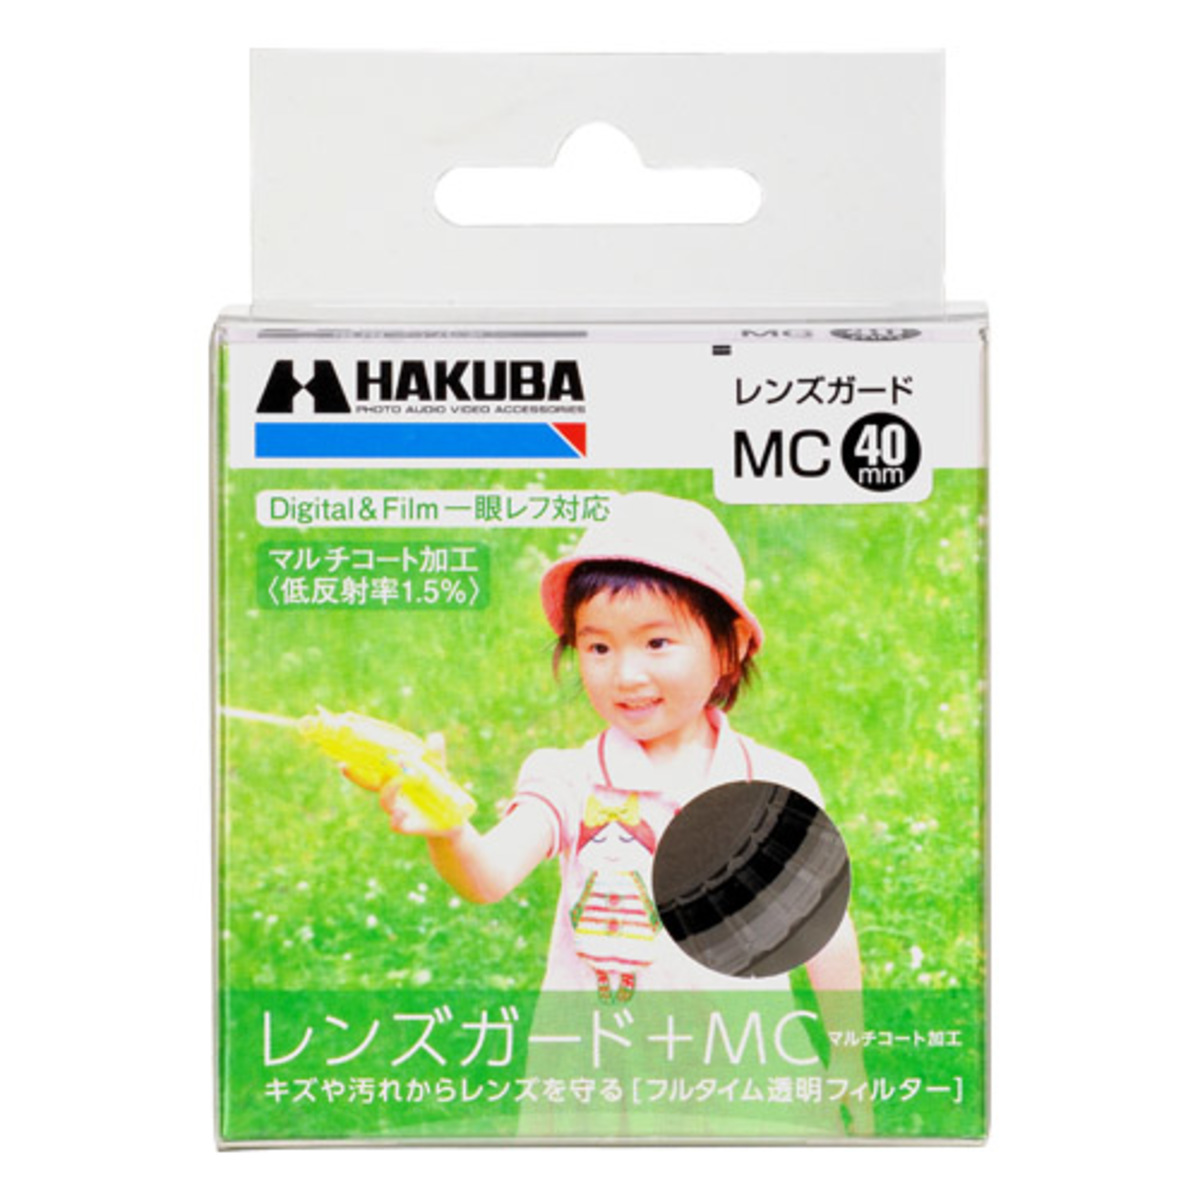 MC UV Protector 72mm Filter 鏡頭保護鏡